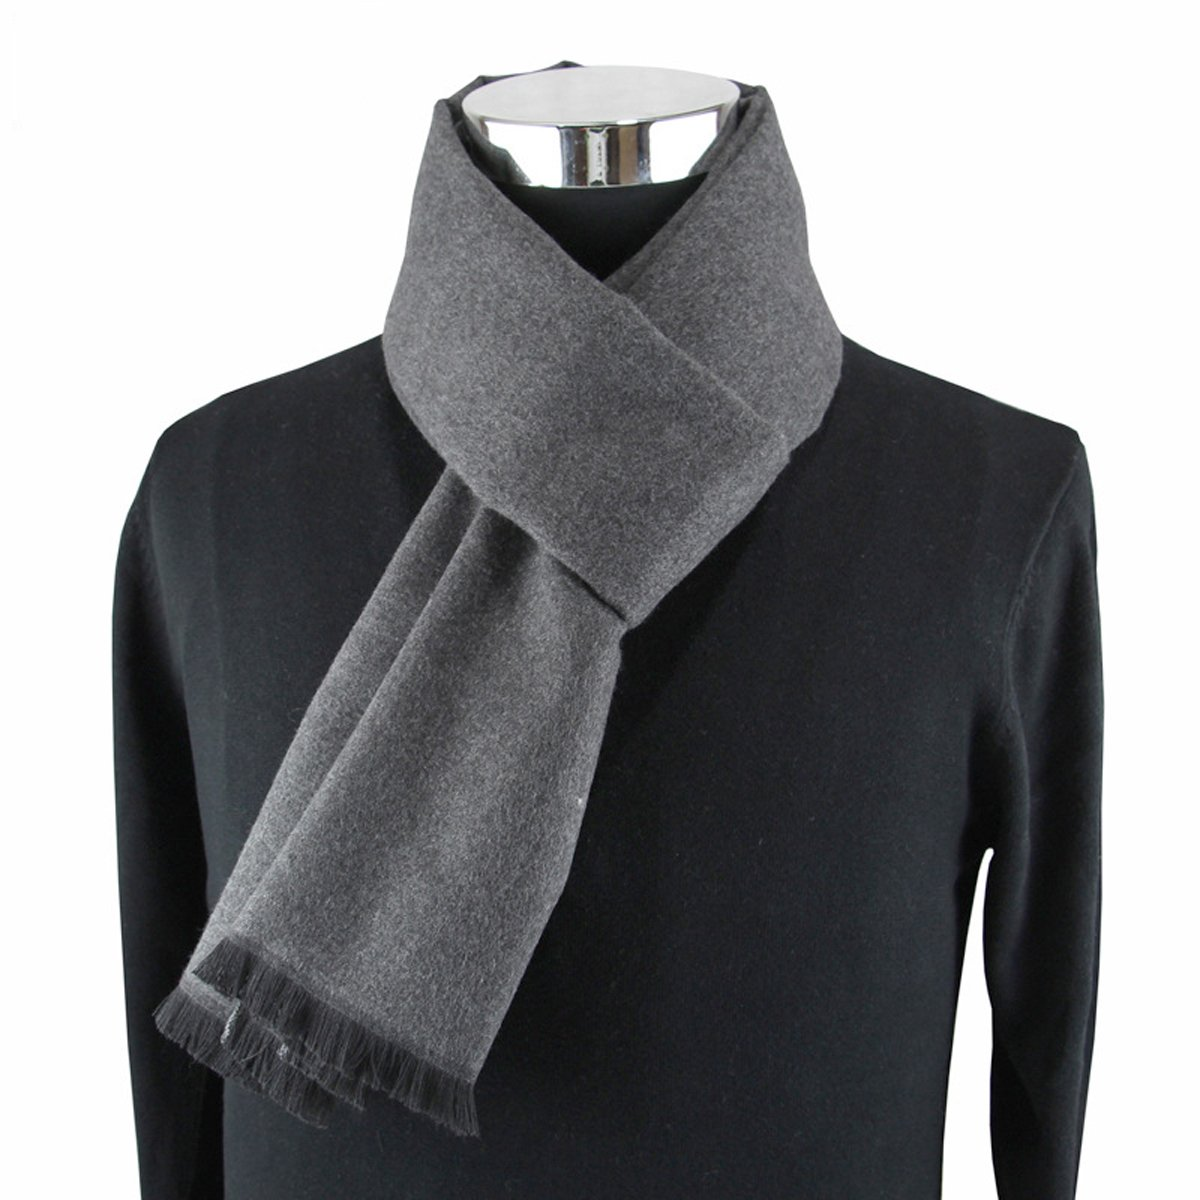 Winday Men's Winter Fall Plaid Stripes Long Cashmere Pashmina Feel Warm Scarves